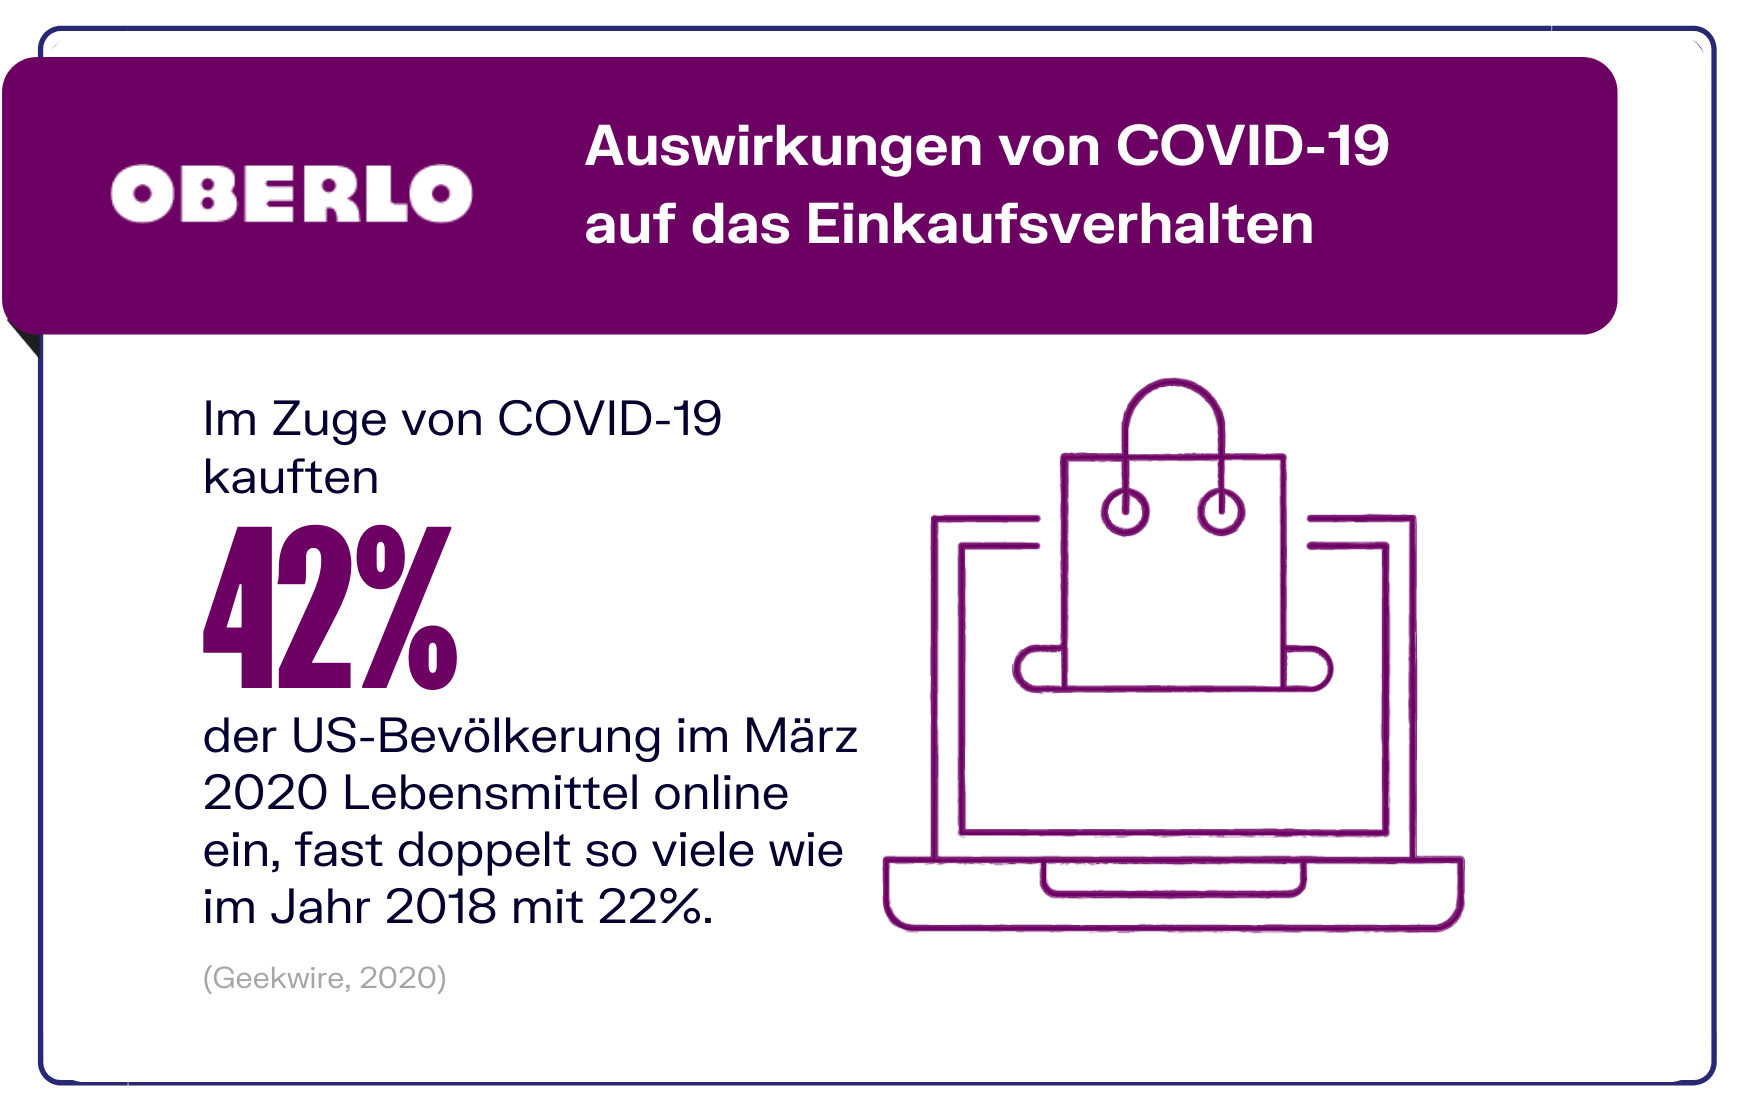 Online Shopping während Covid